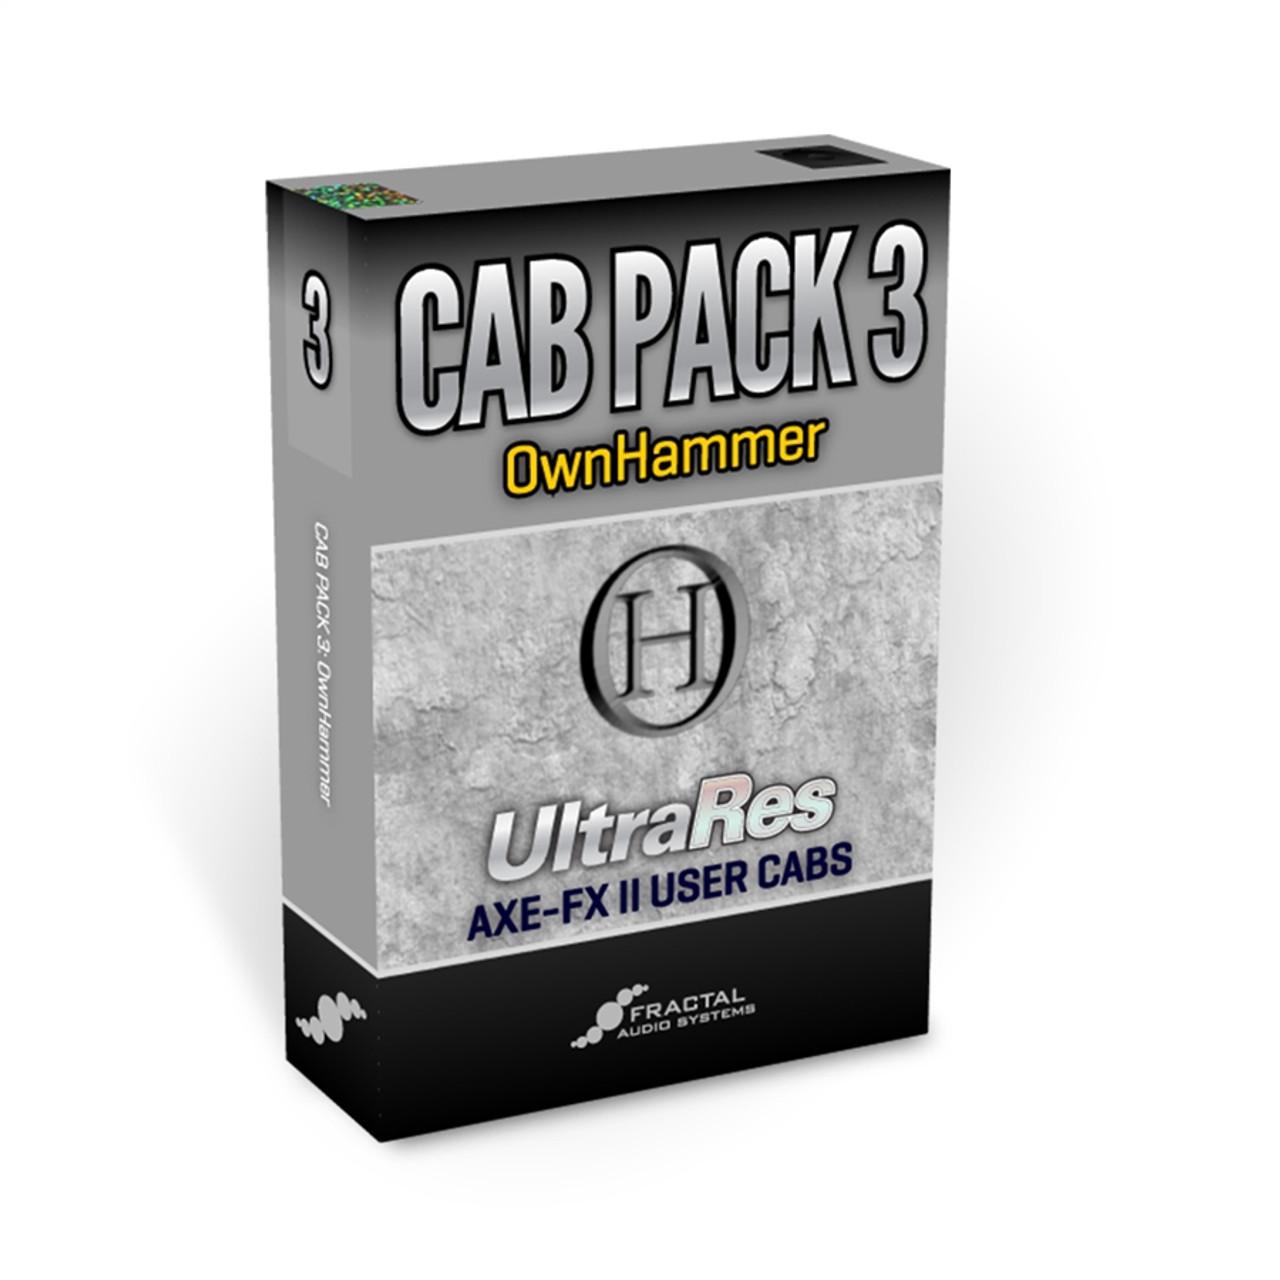 Cab Pack 3: OwnHammer UltraRes